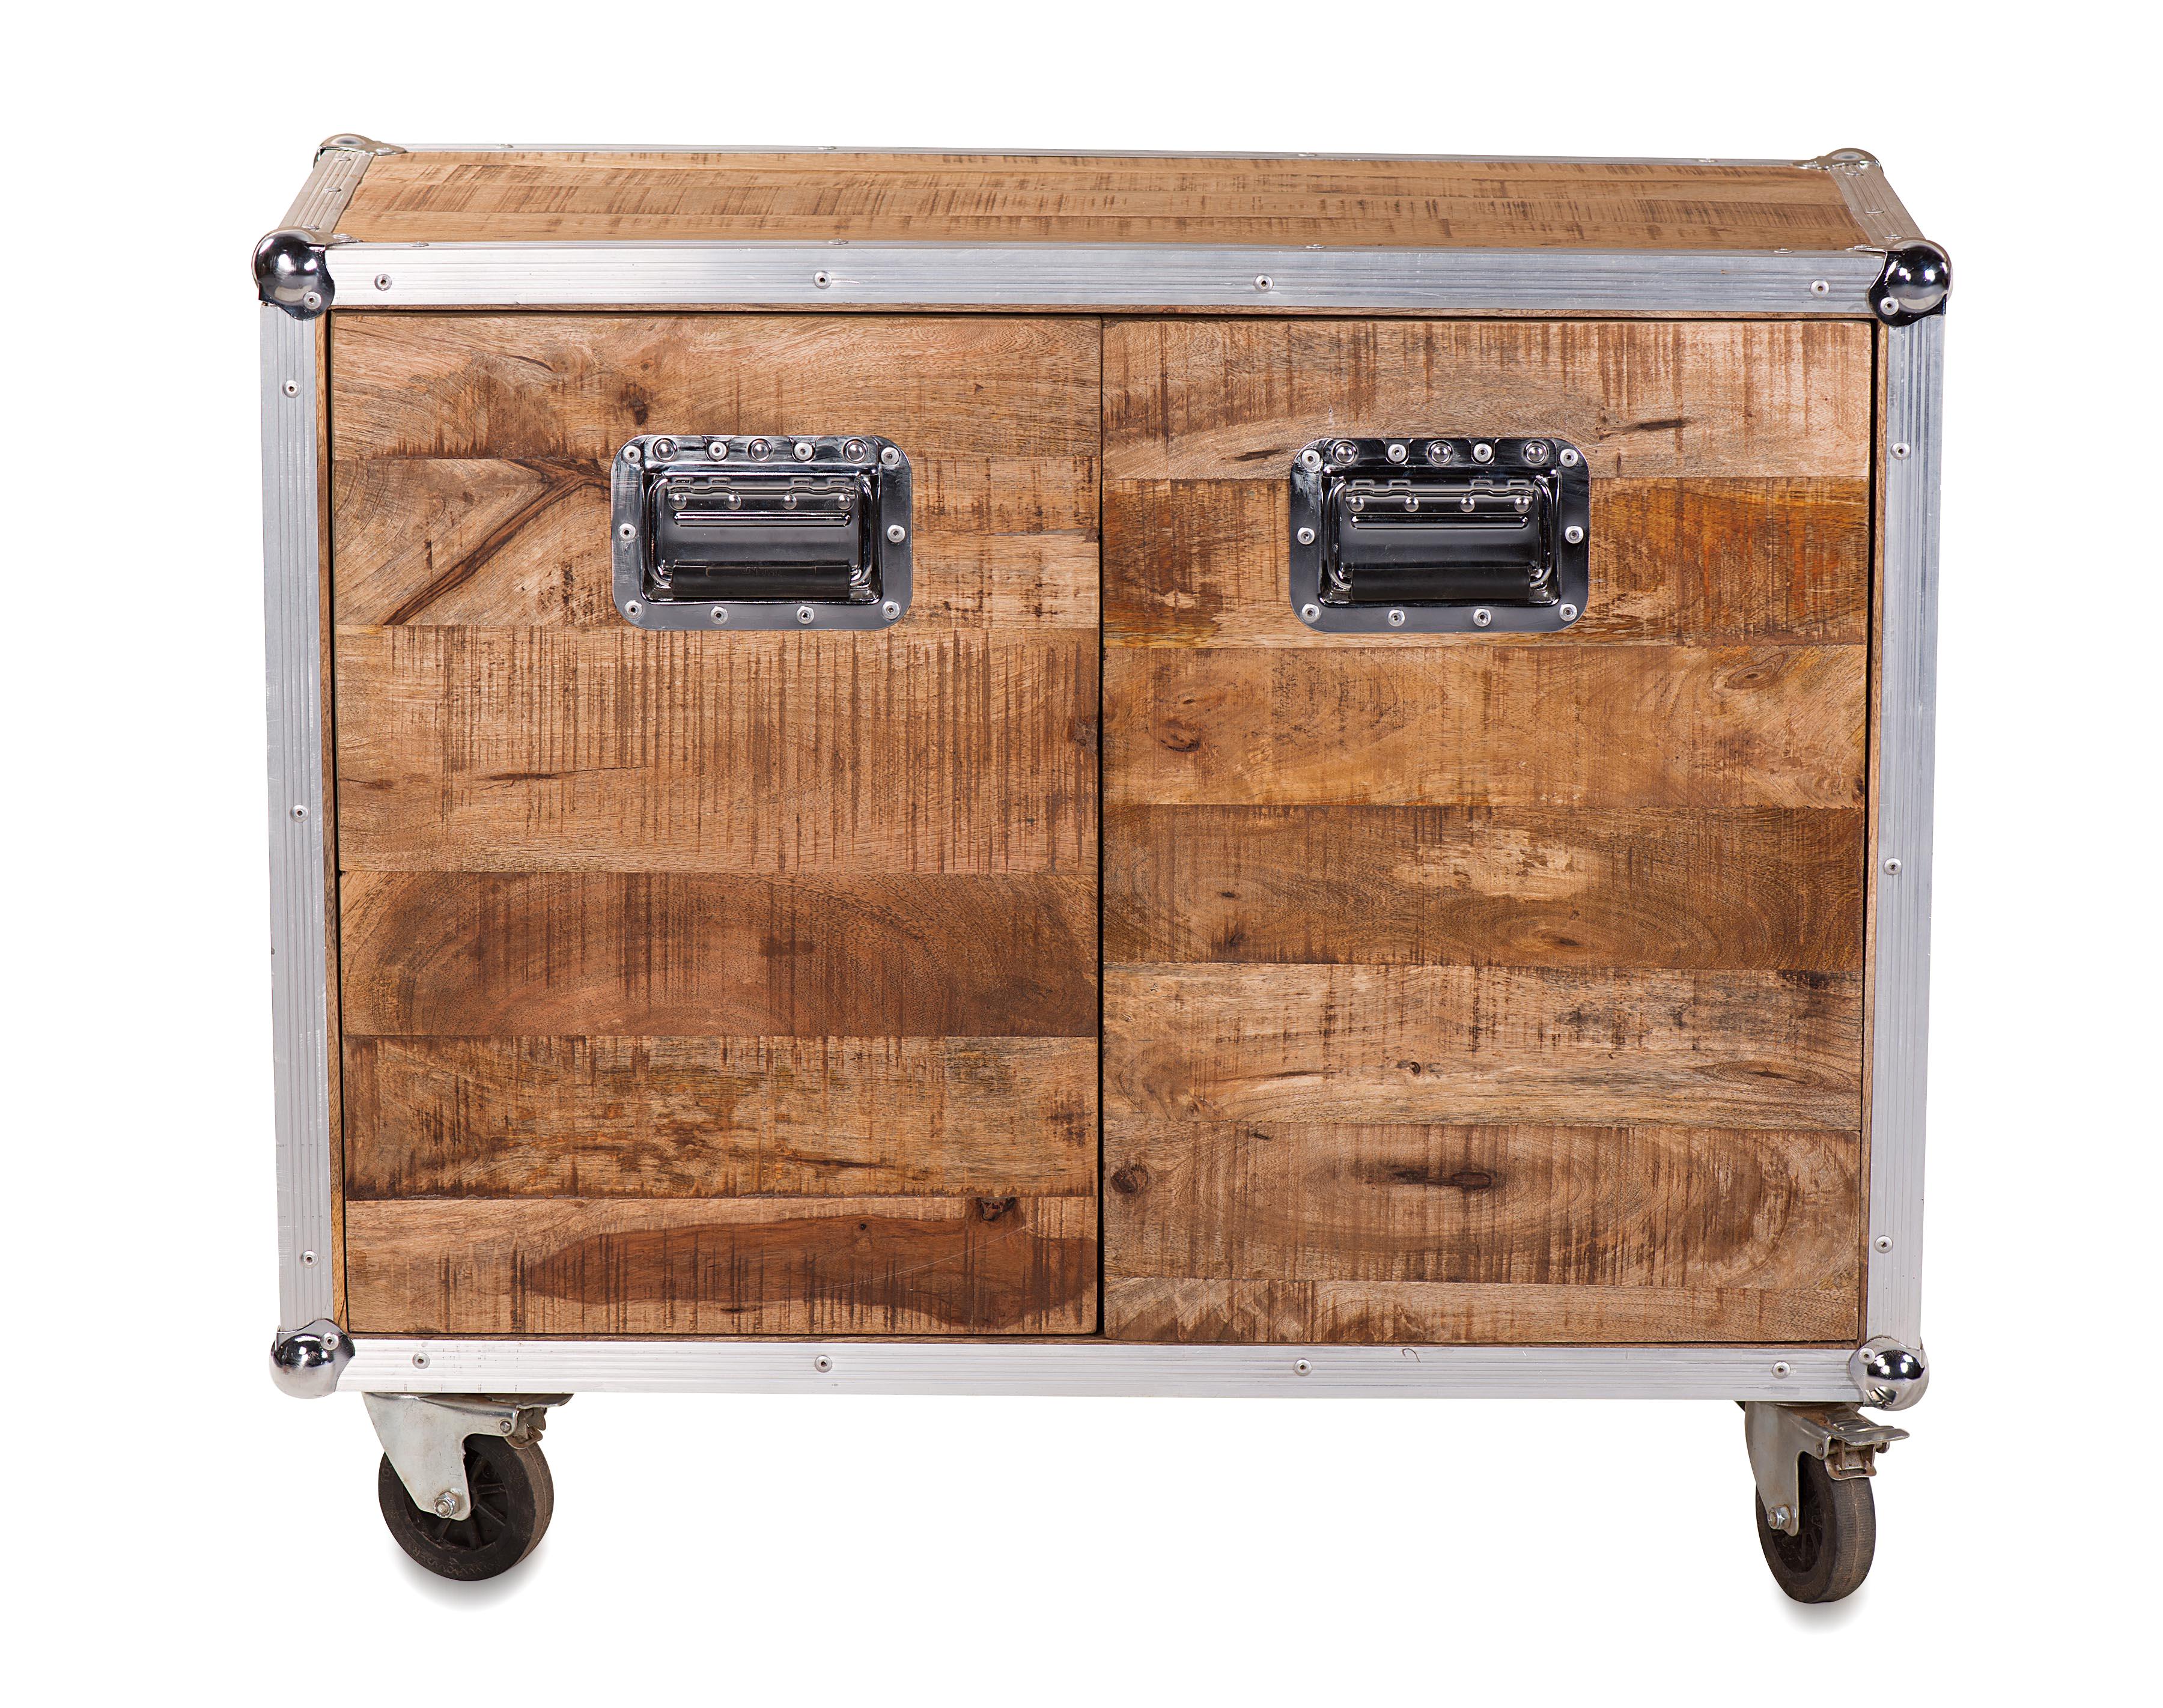 Couchtisch Truhe Im Industrial Chic Design Aus Recycling Holz